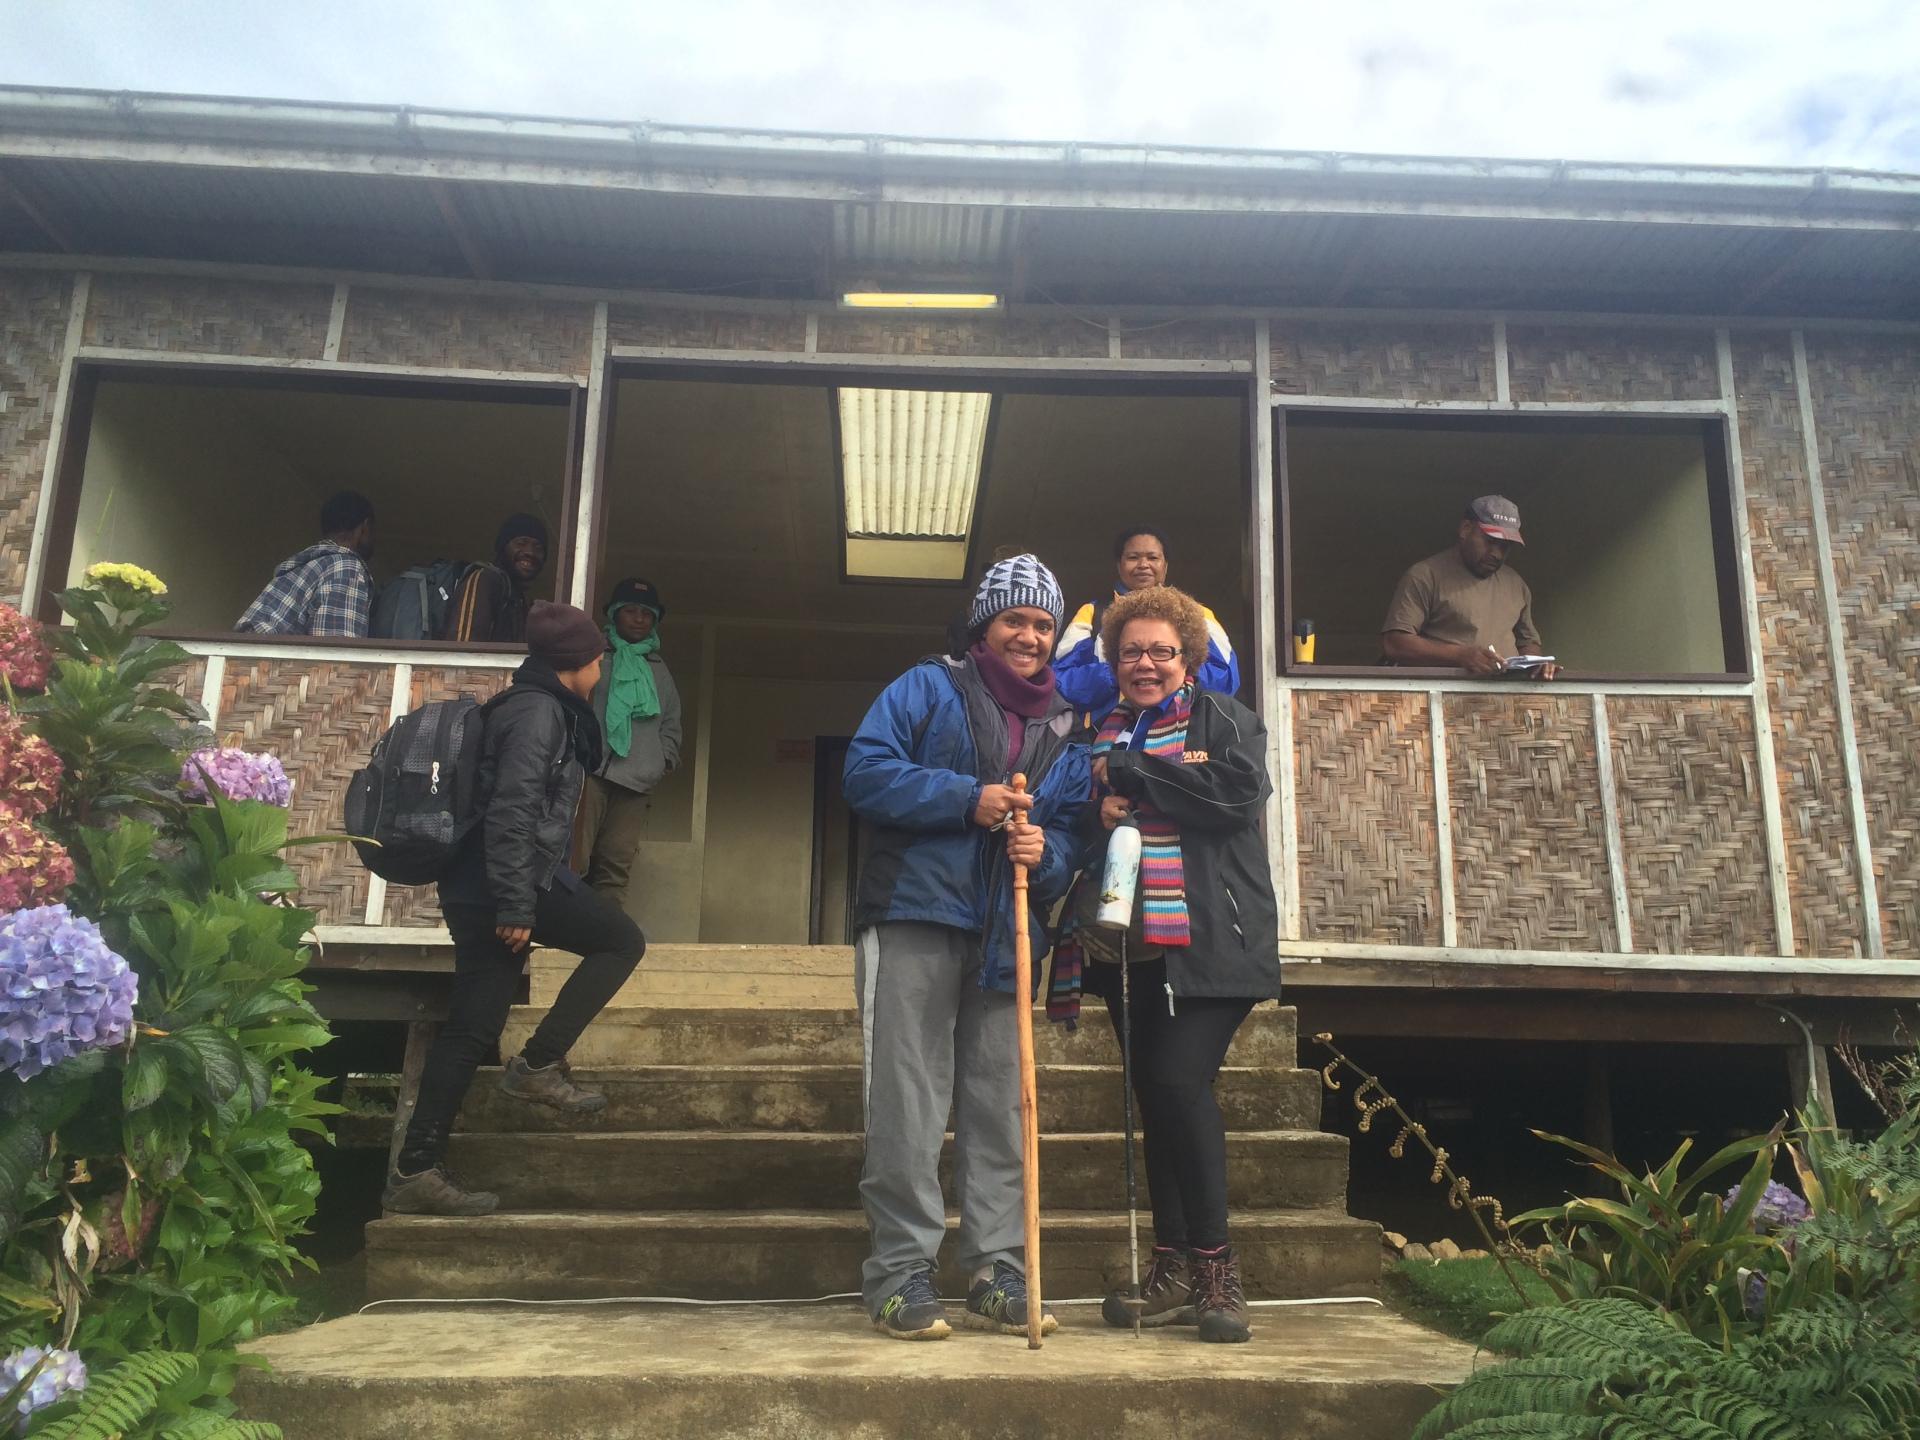 Camp JJ;  Mt Wilhelm; PNG Tourism; Mount Wilhelm; Climbing; Trekking; PNG; Papua New Guinea